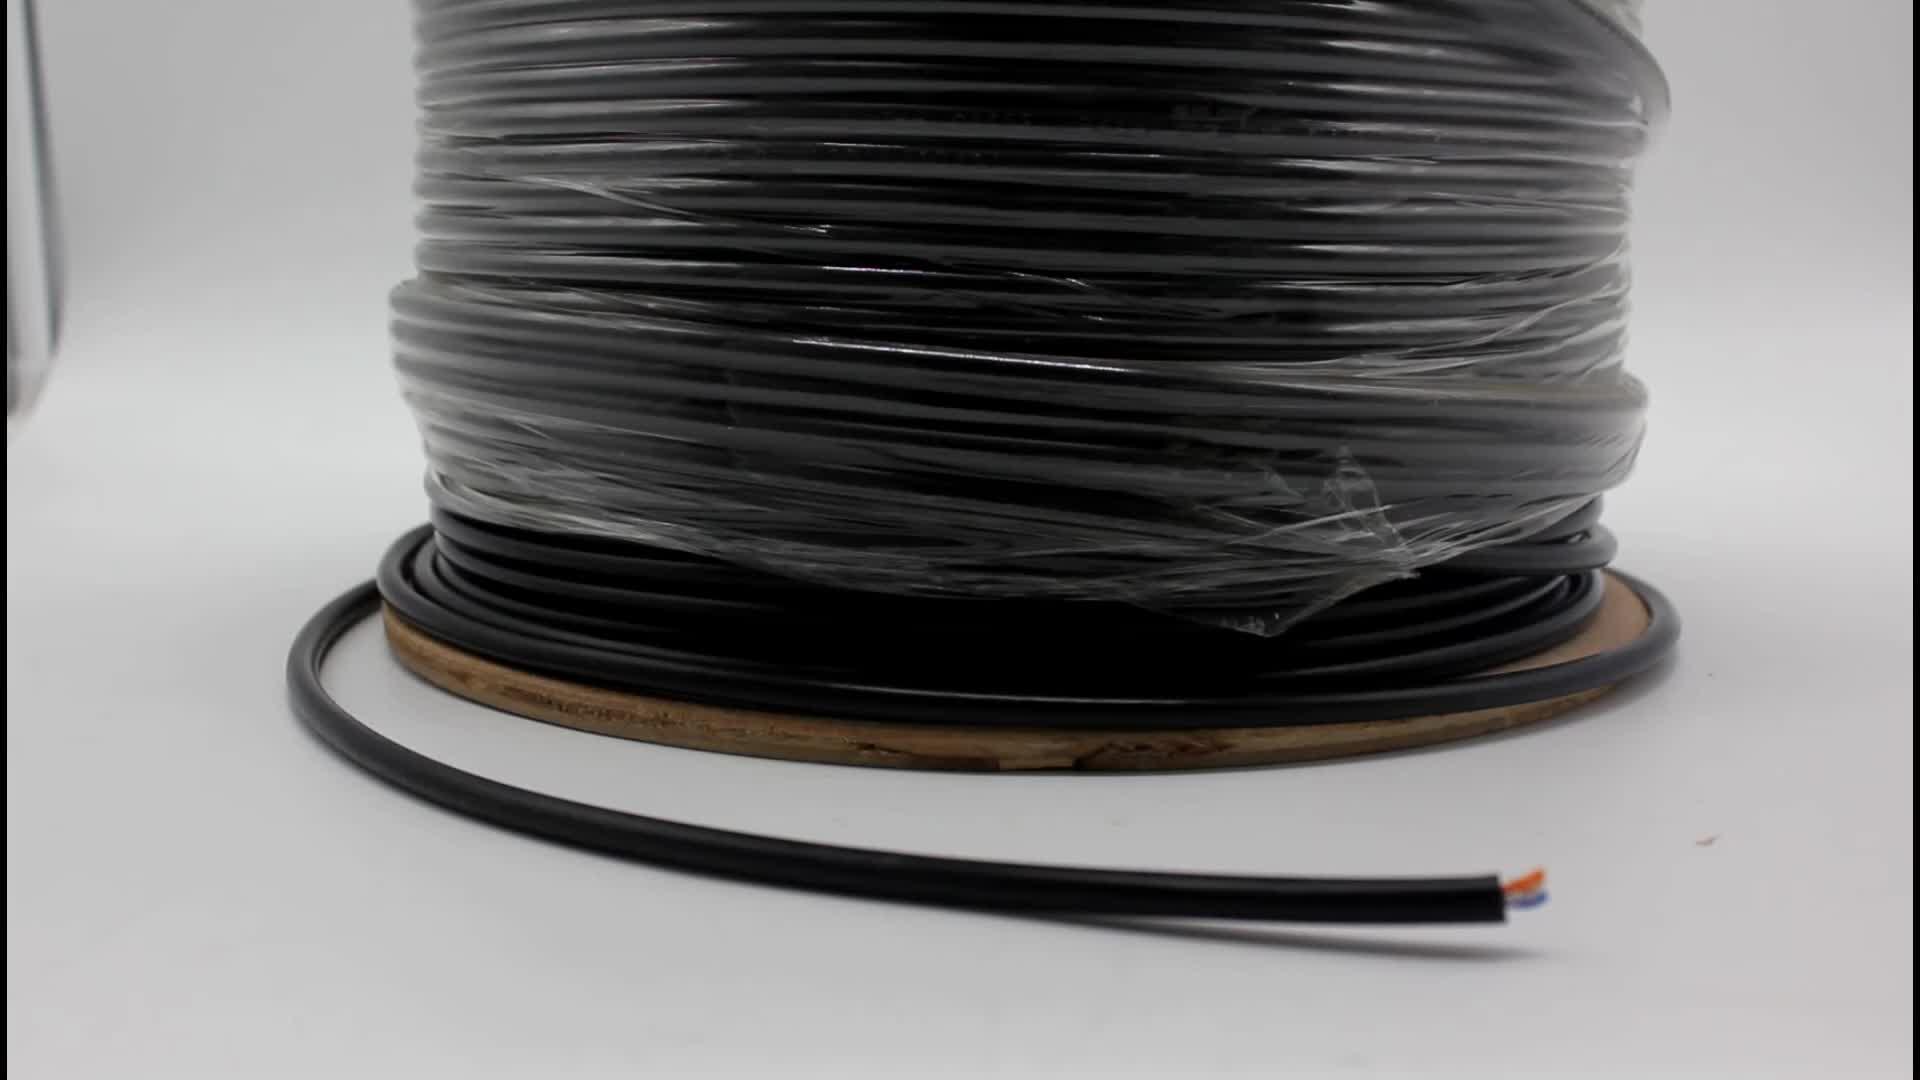 Aixton CAT6 FTP 23AWG 0,56mm Reinem Kupfer PVC + PE Doppel mantel 100m preis katze 6 außen kabel